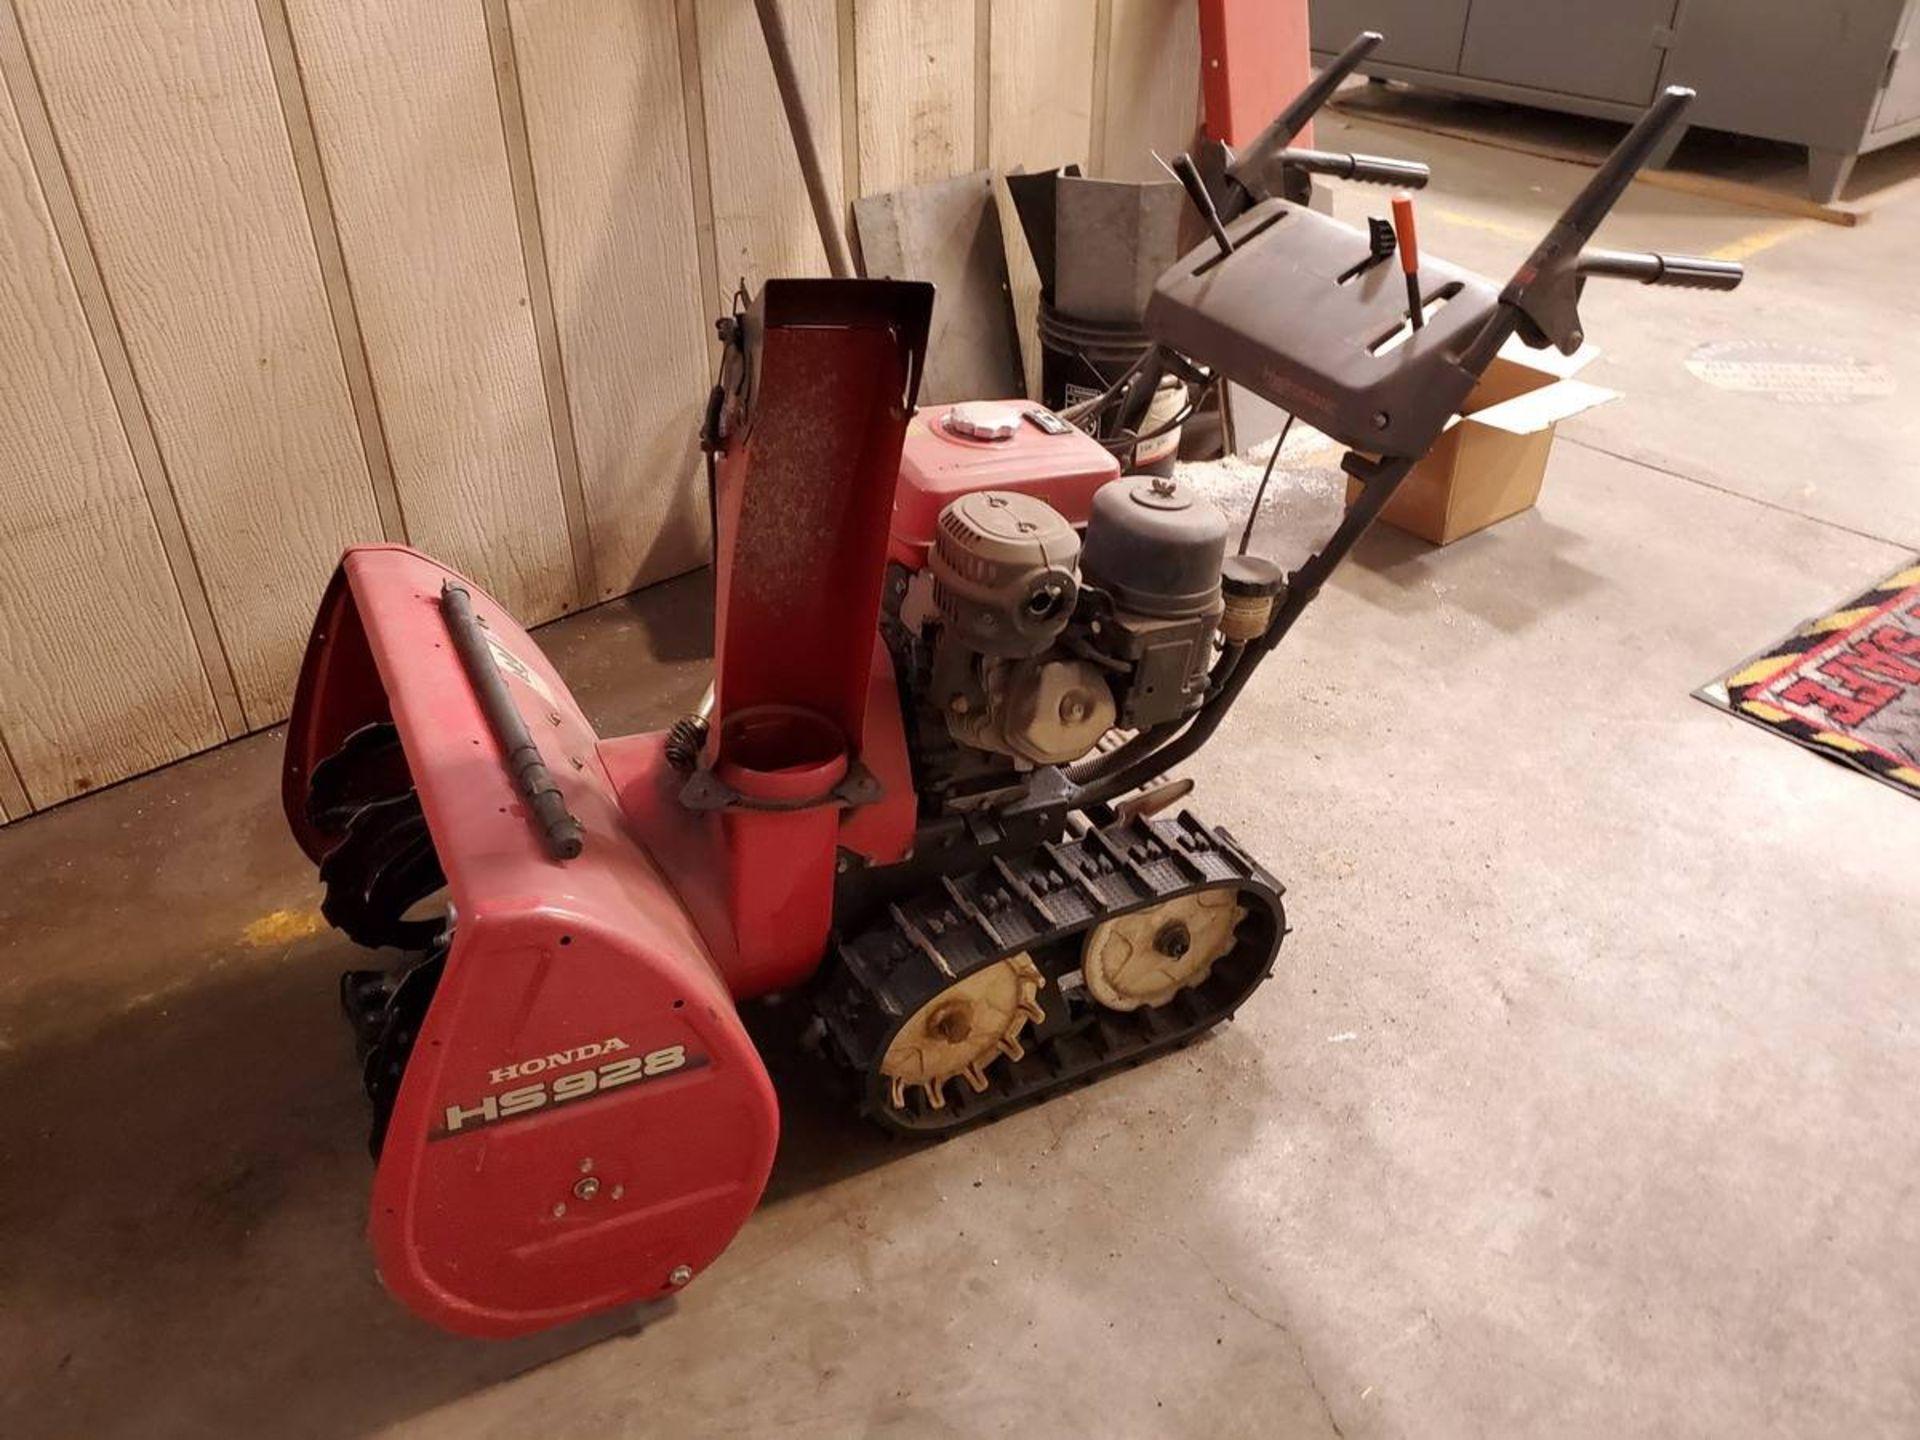 Lot 358 - Honda Snow Blower